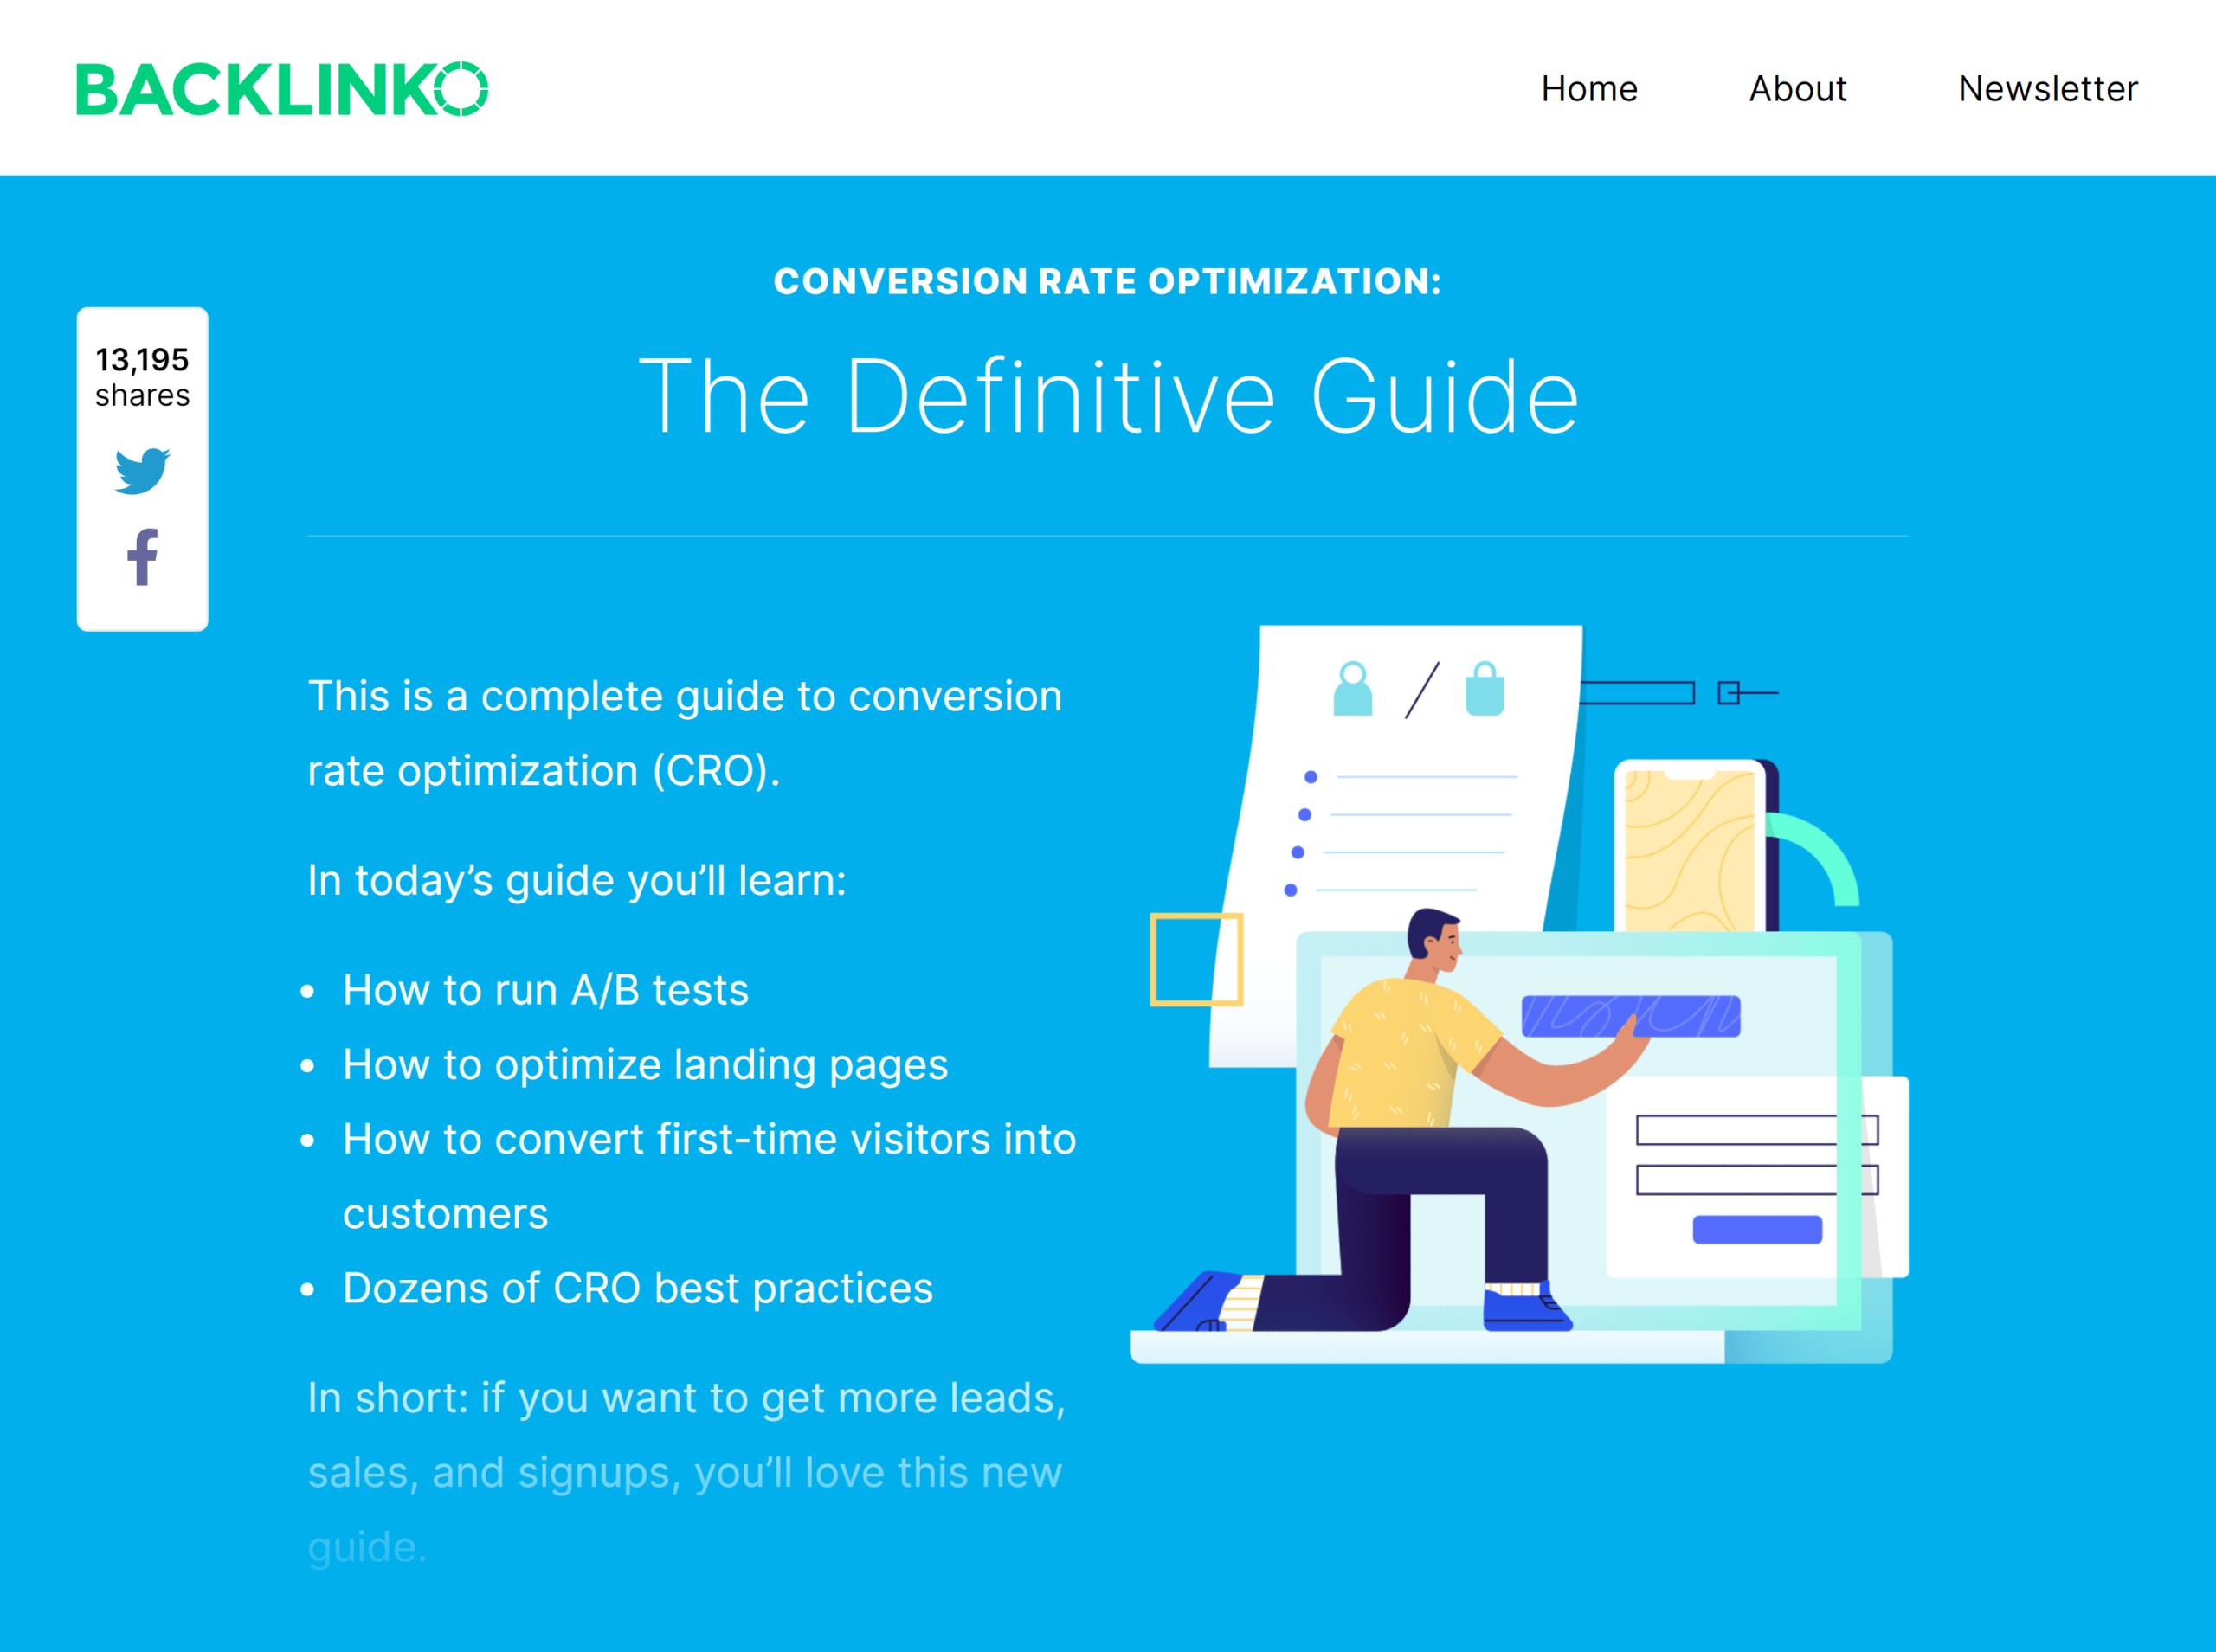 Backlinko – Conversion rate optimization